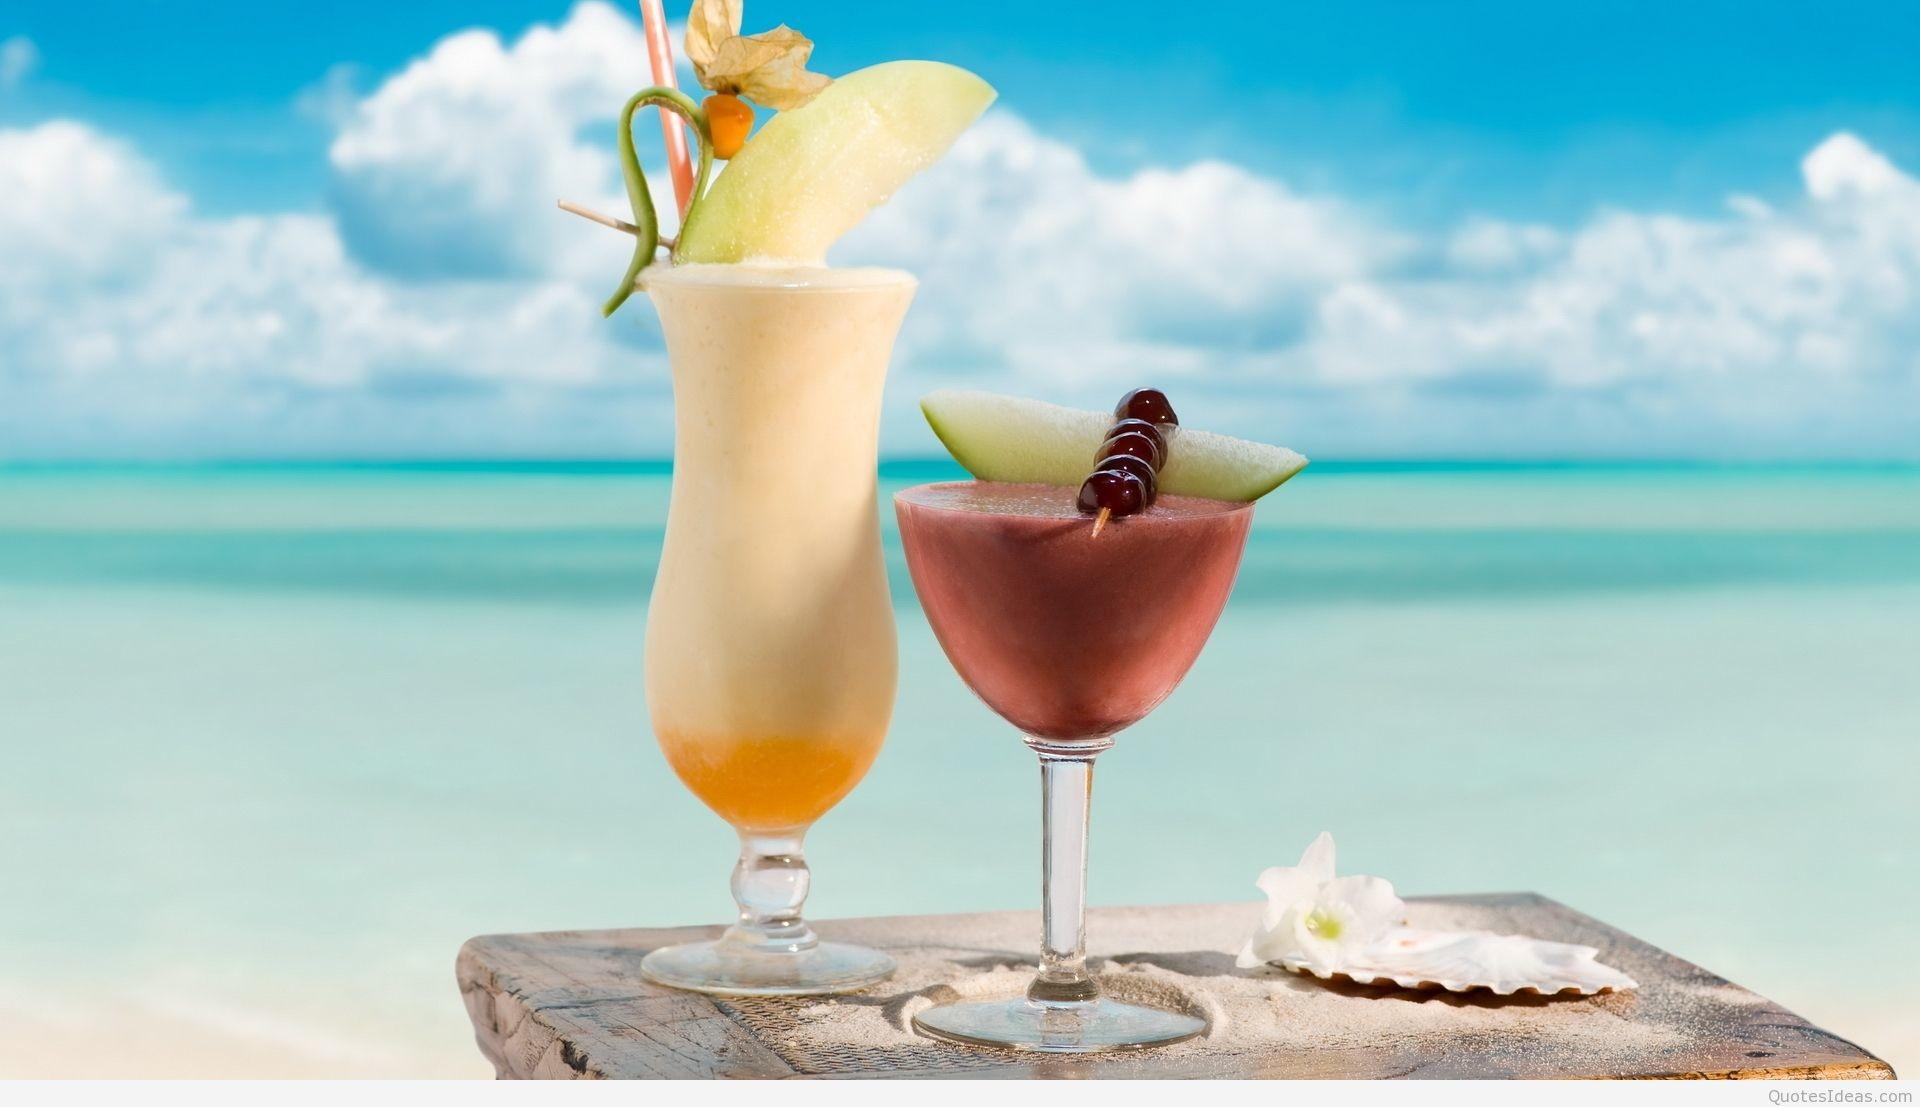 … ws_Summer_Beach_1024x768 Awesome-Summer-Drink-Wallpaper-HD …